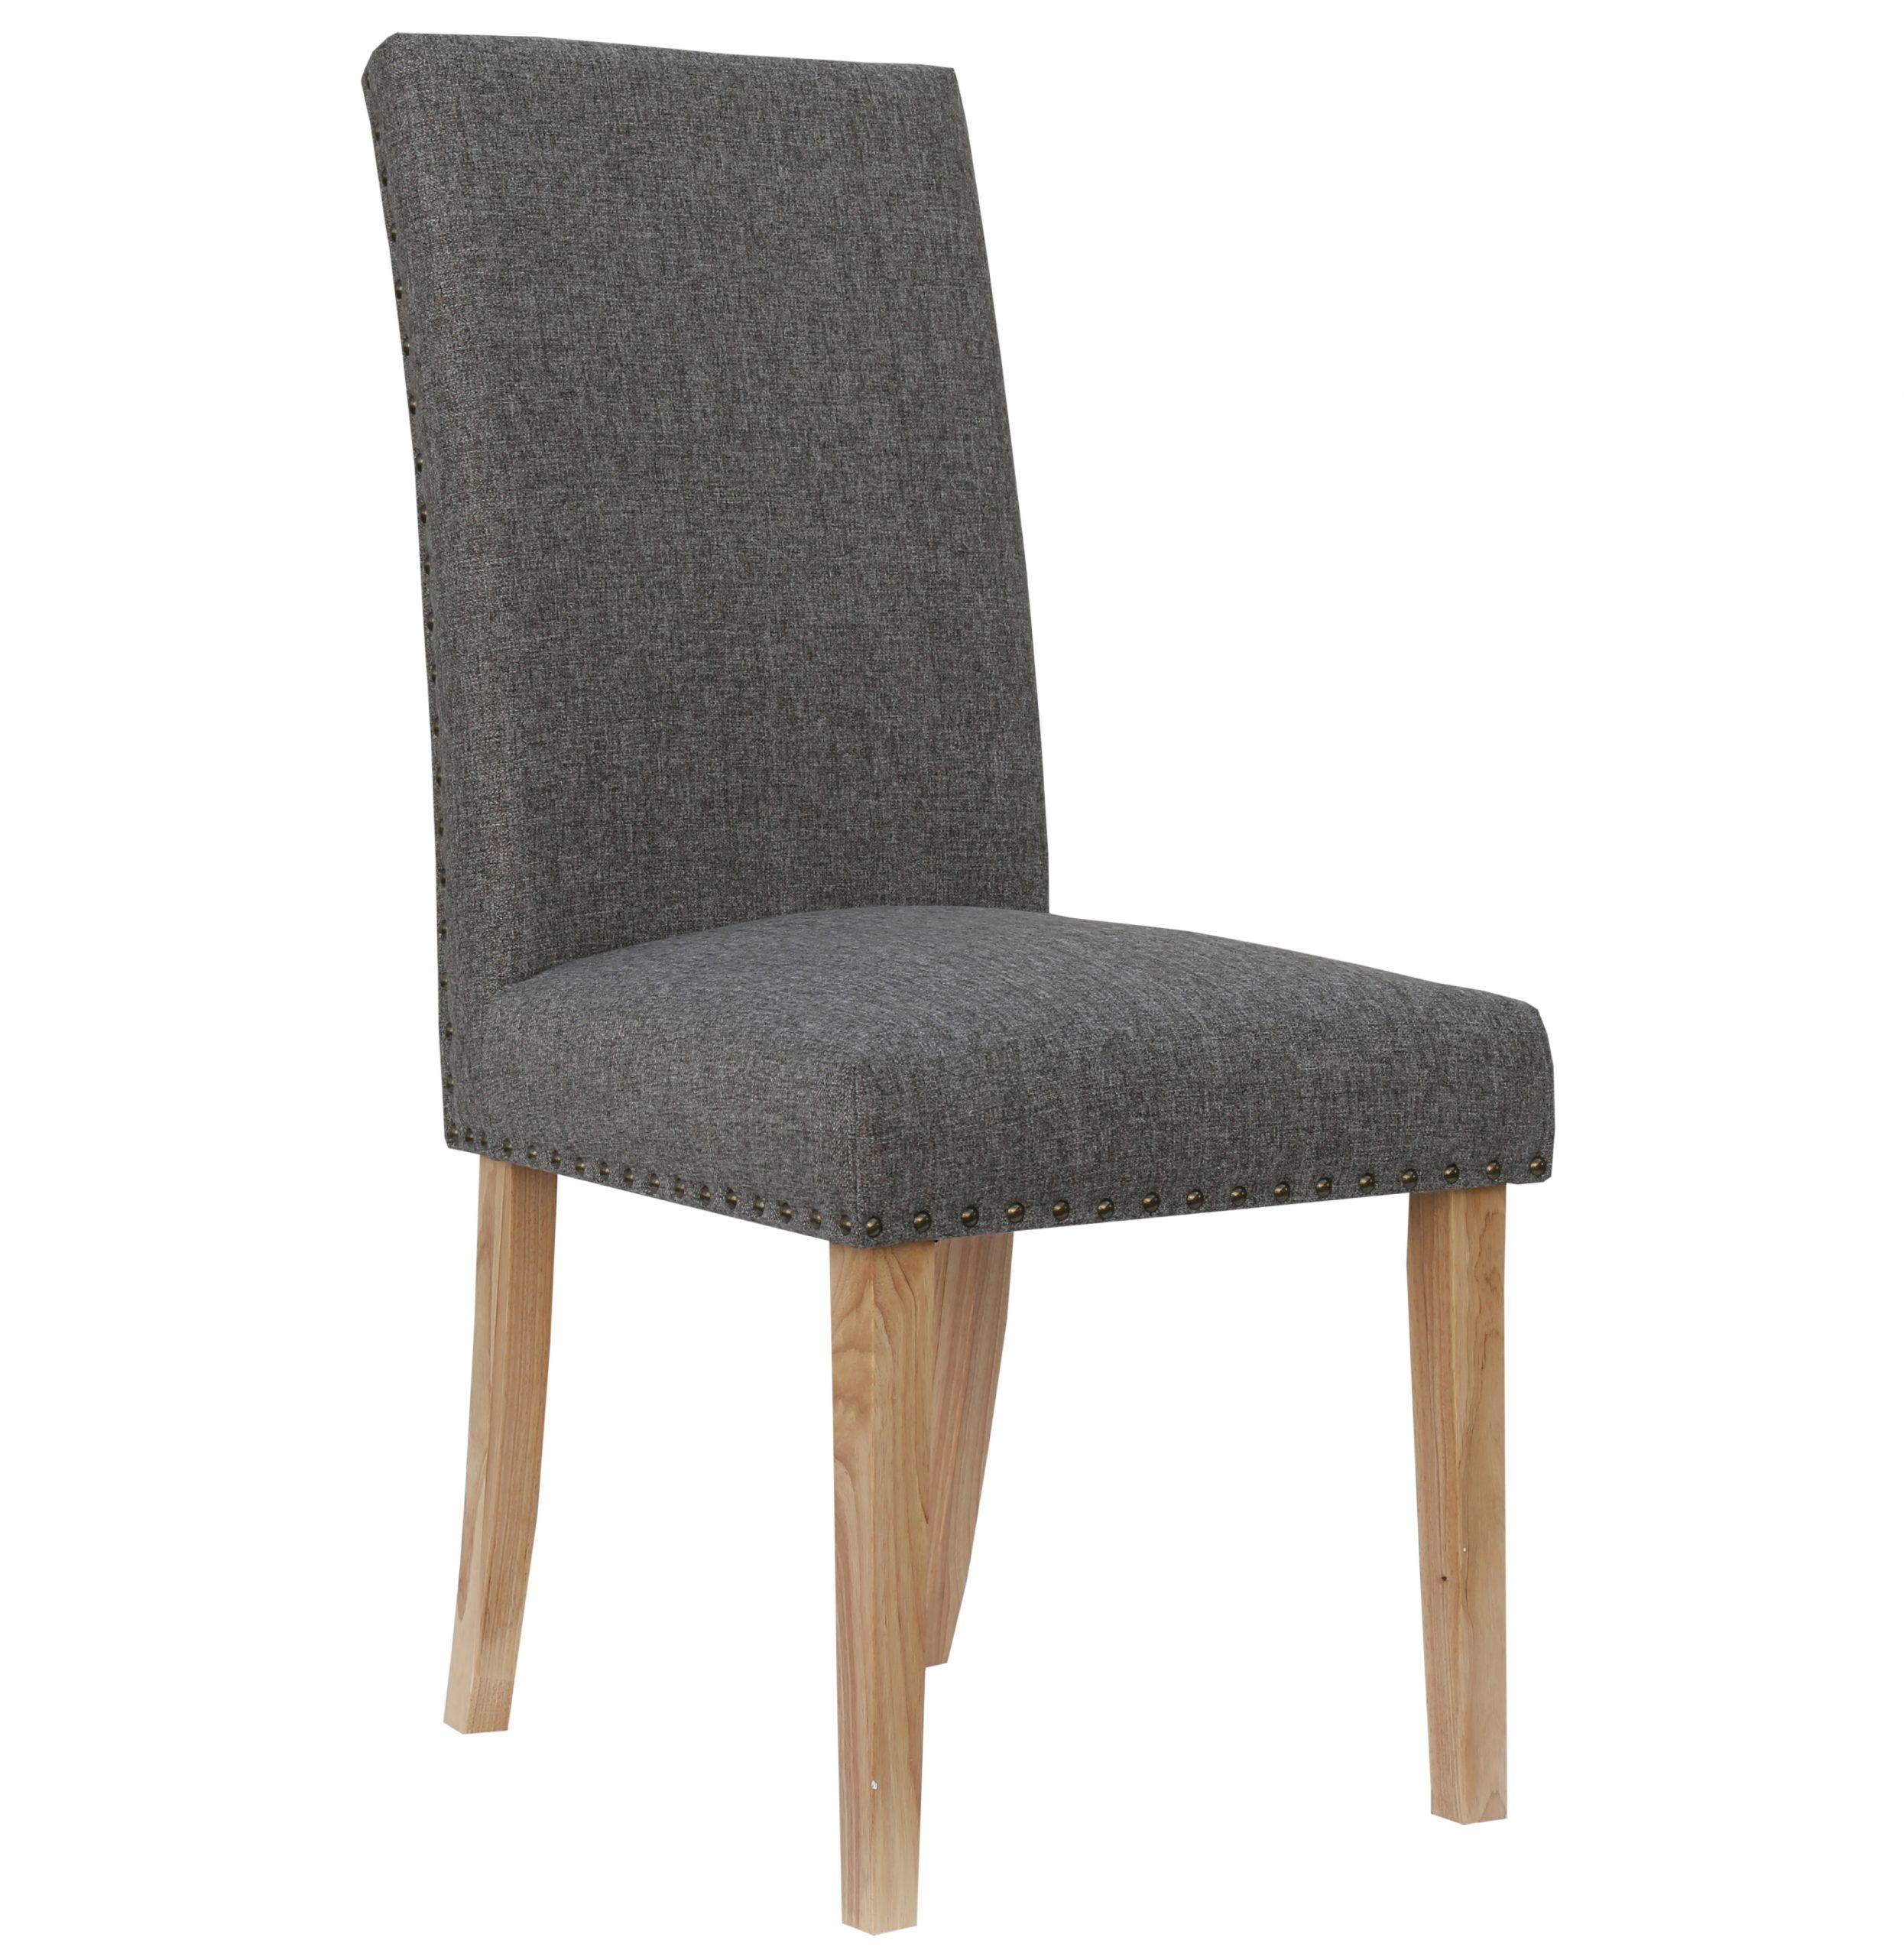 Bromley Dark Grey Herringbone fabric dining chair